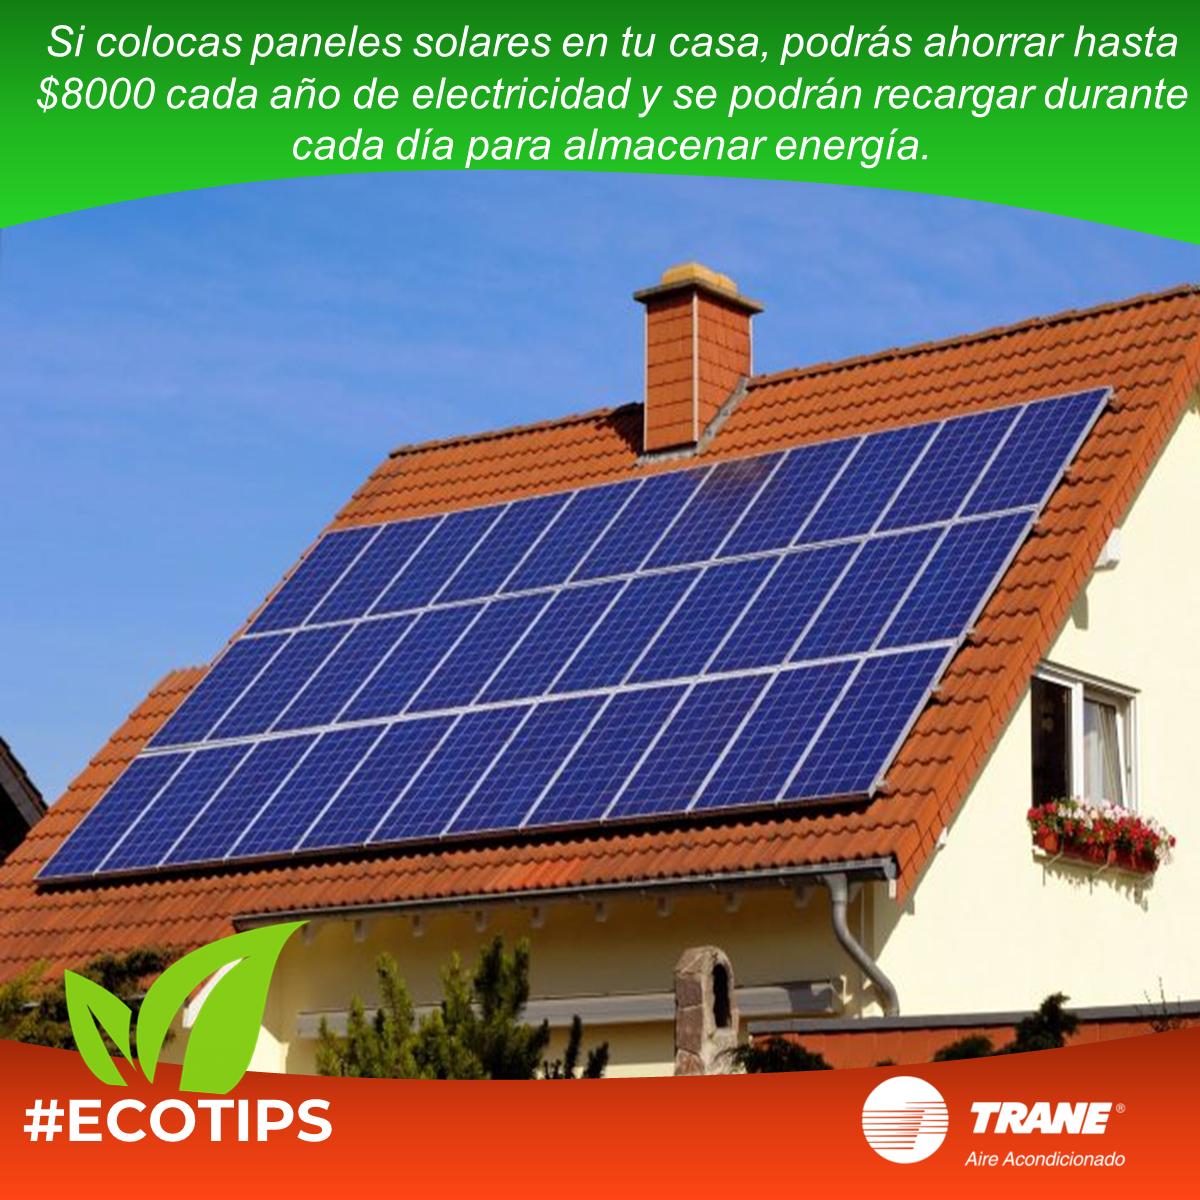 Ecotips En 2020 Paneles Solares Instalacion De Paneles Solares Energia Solar